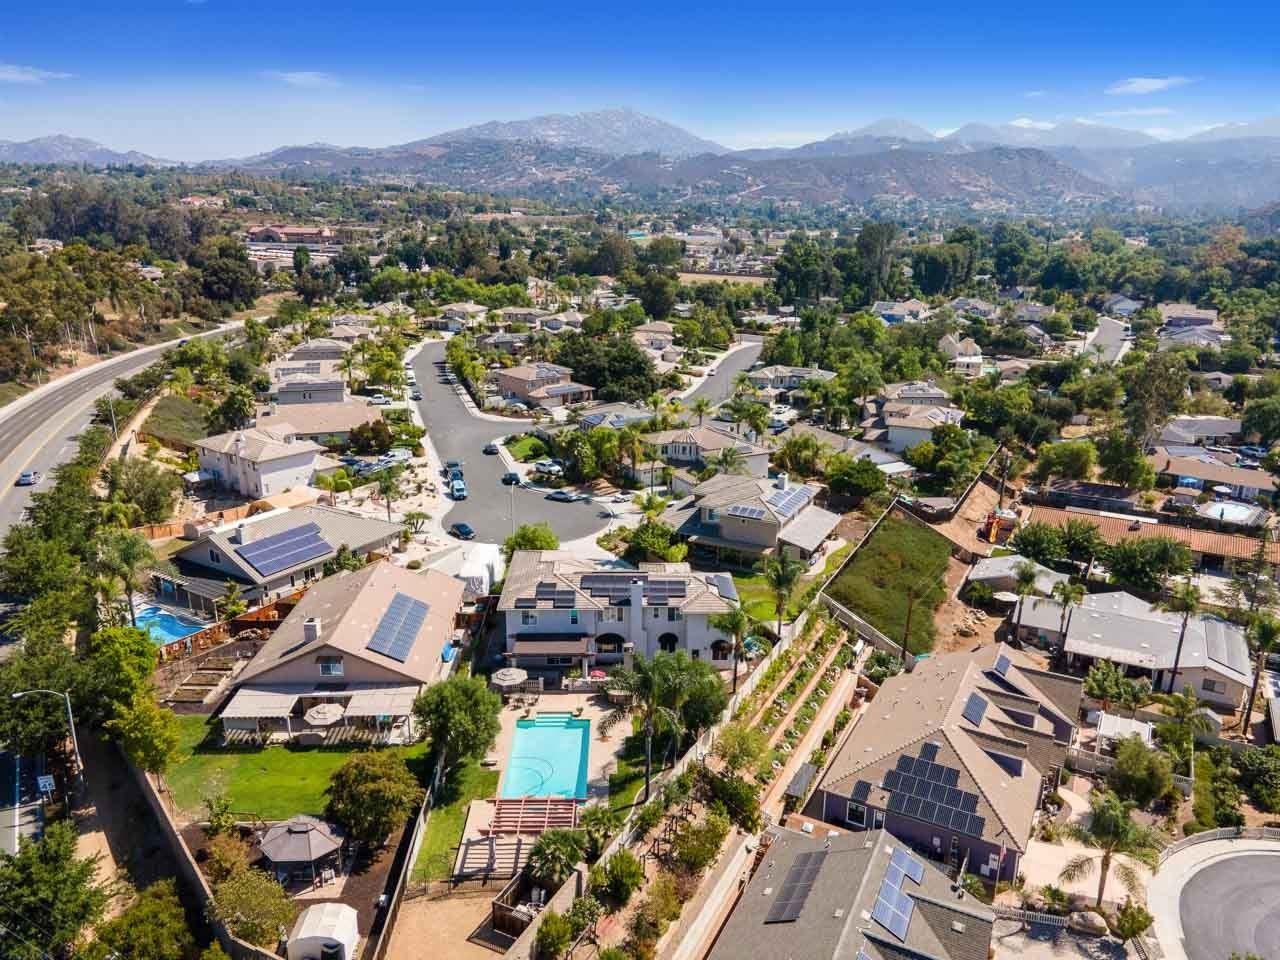 Photo of 14450 KENTFIELD PLACE, Poway, CA 92064 (MLS # 200043979)